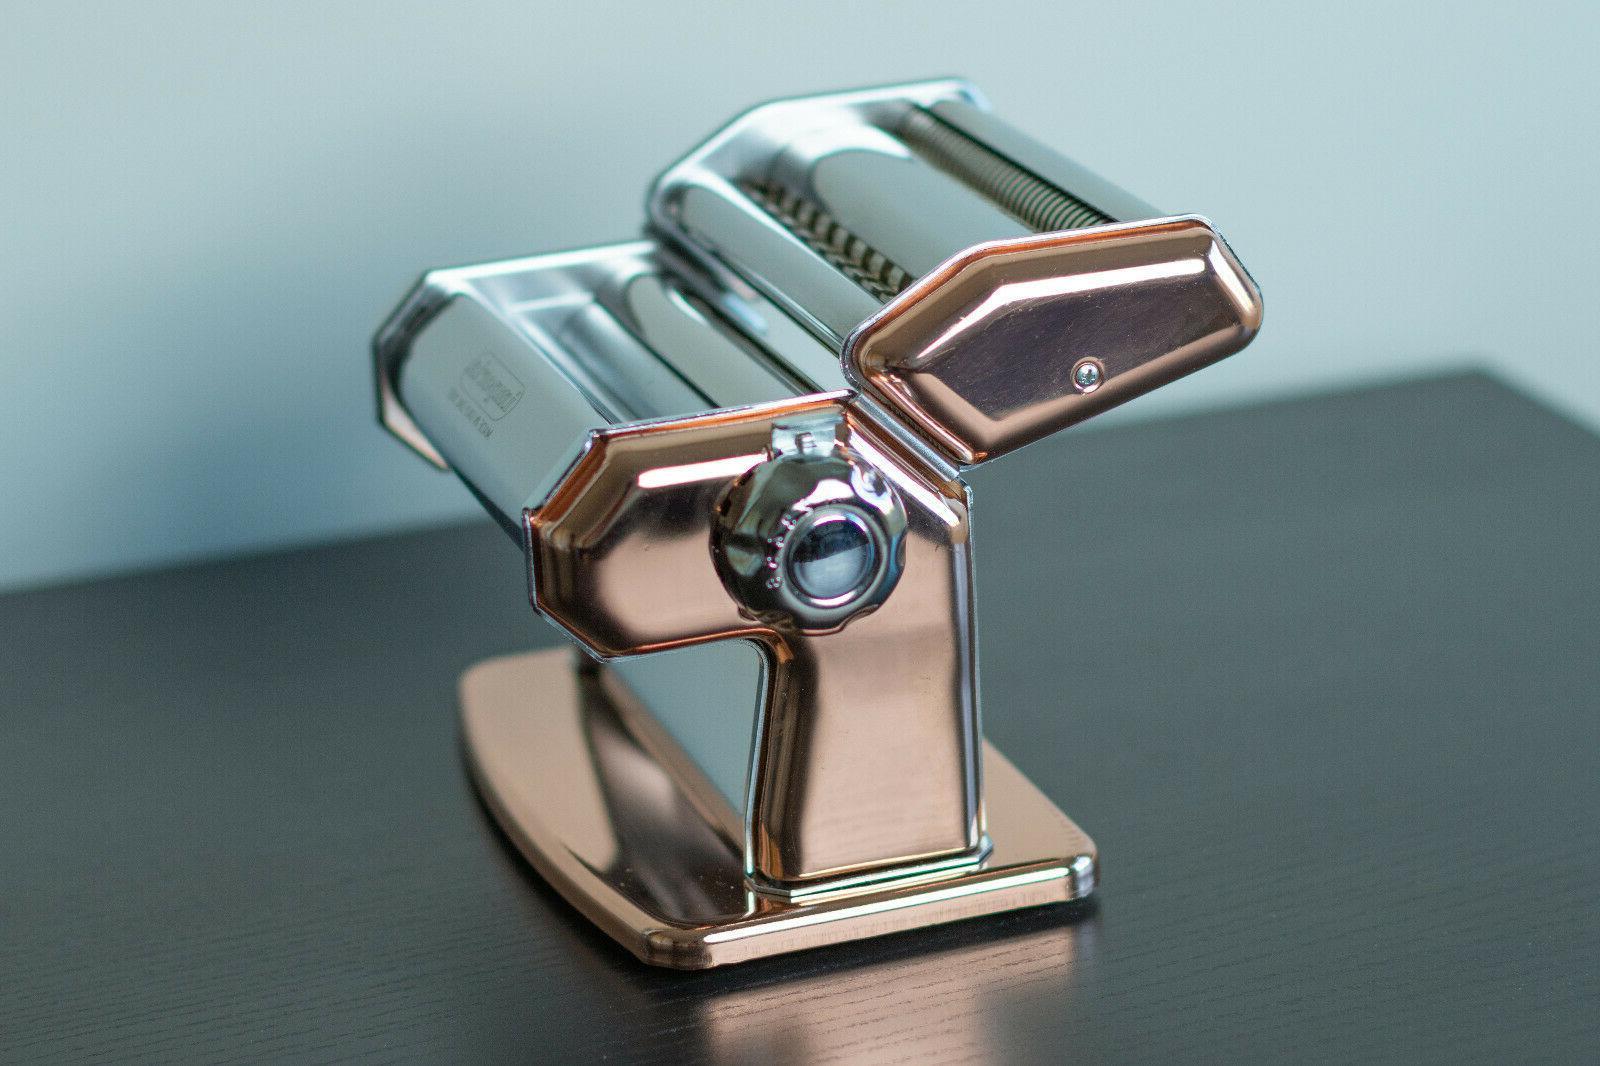 Imperia Pasta Maker Machine - Heavy Stainless Steel Lock - SP150